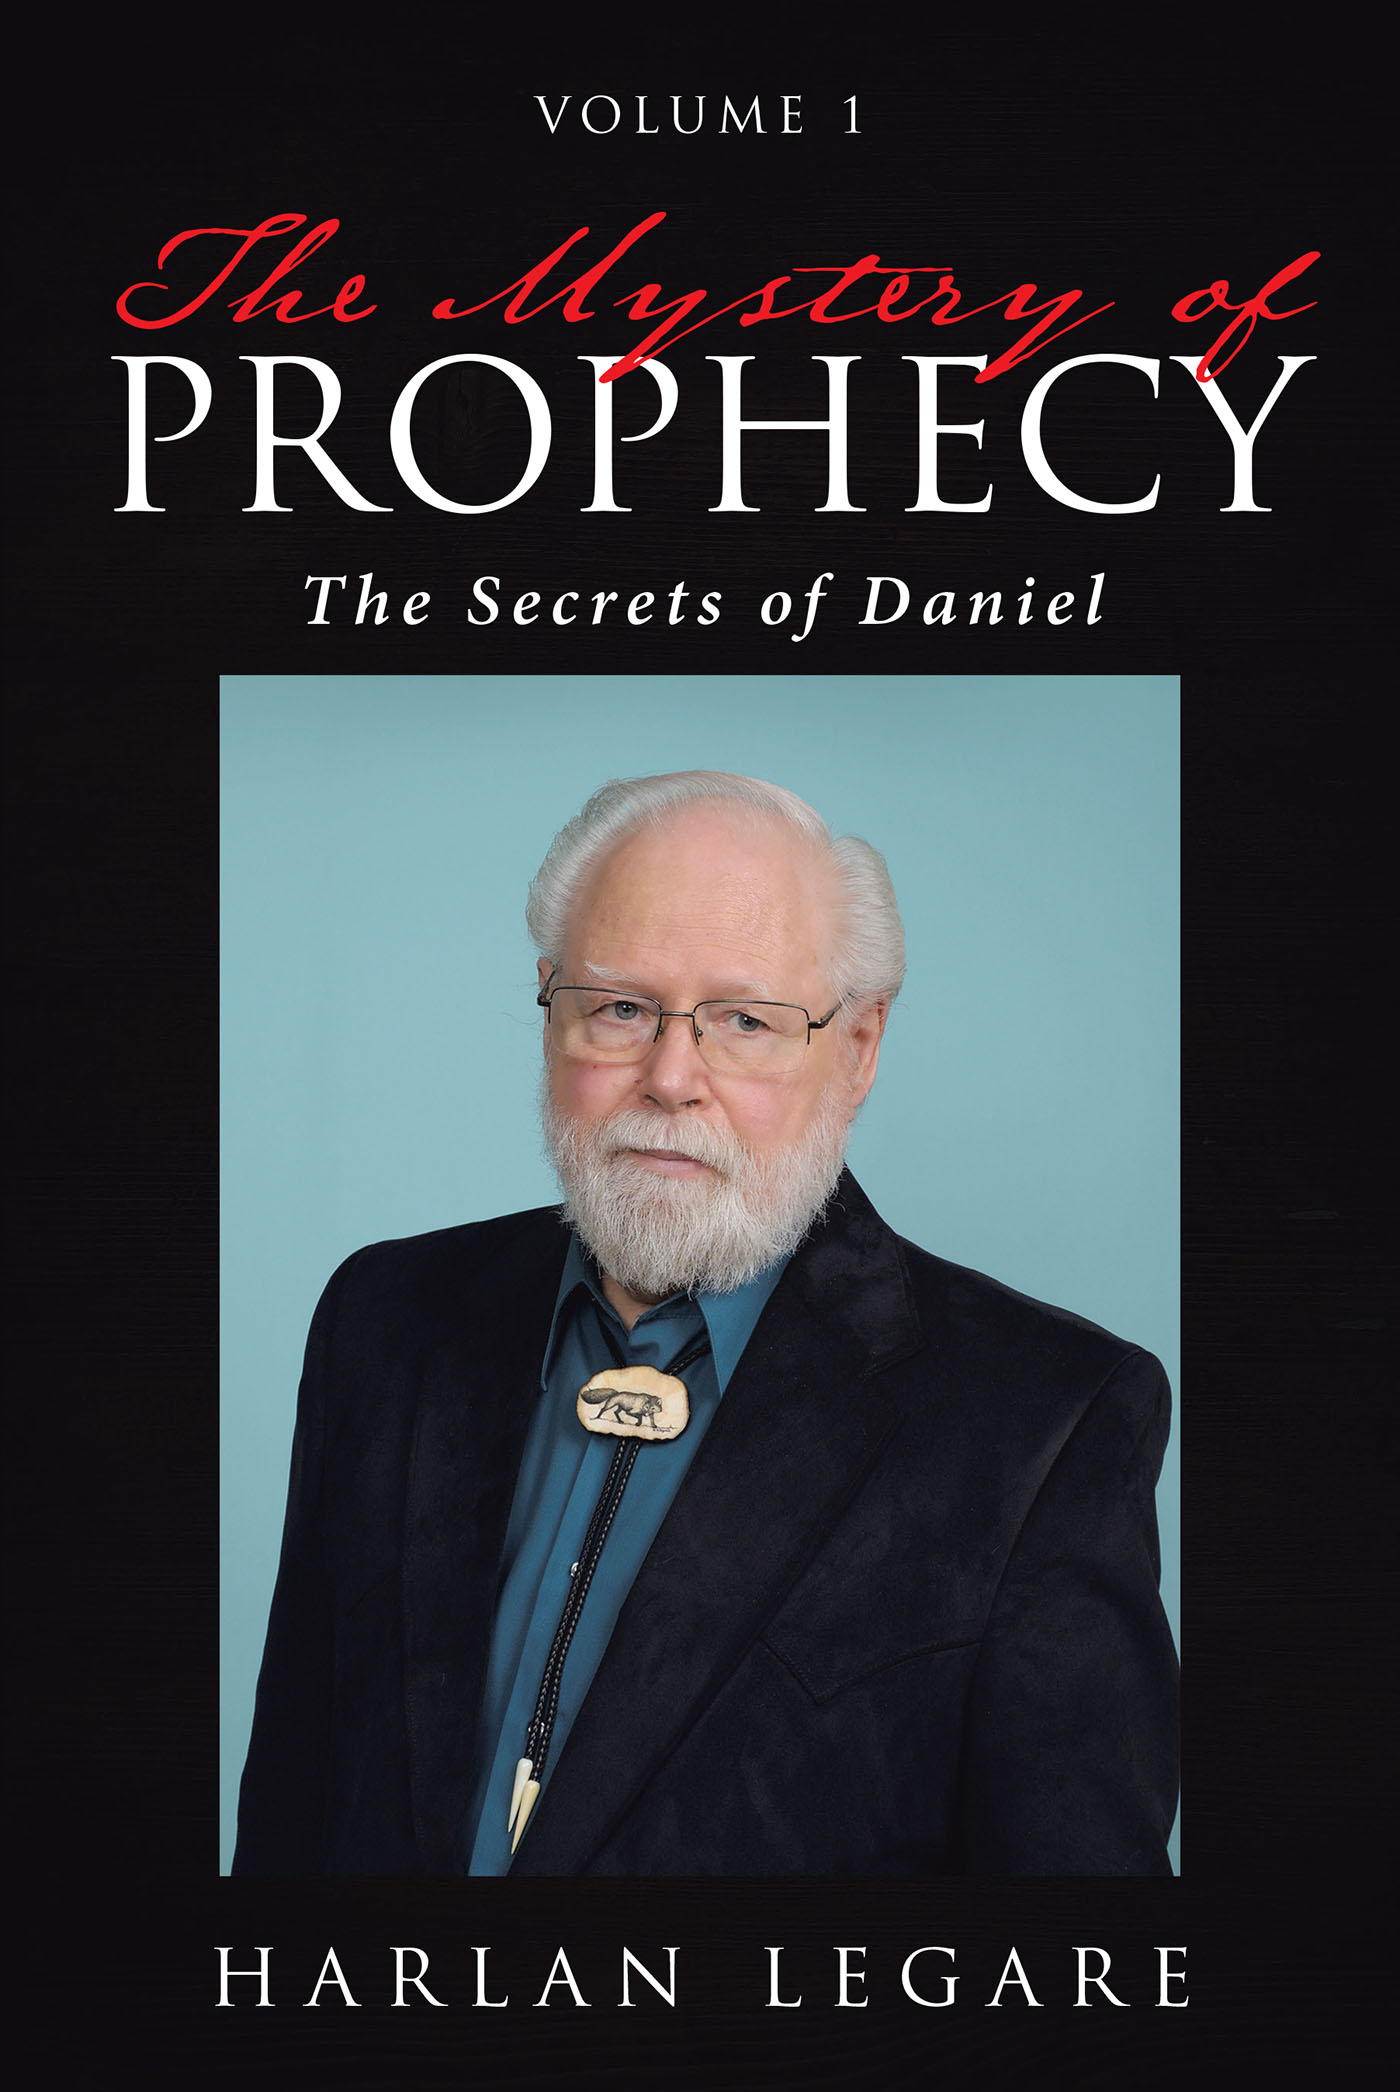 Gods Prophetic Spirit - Volume 1